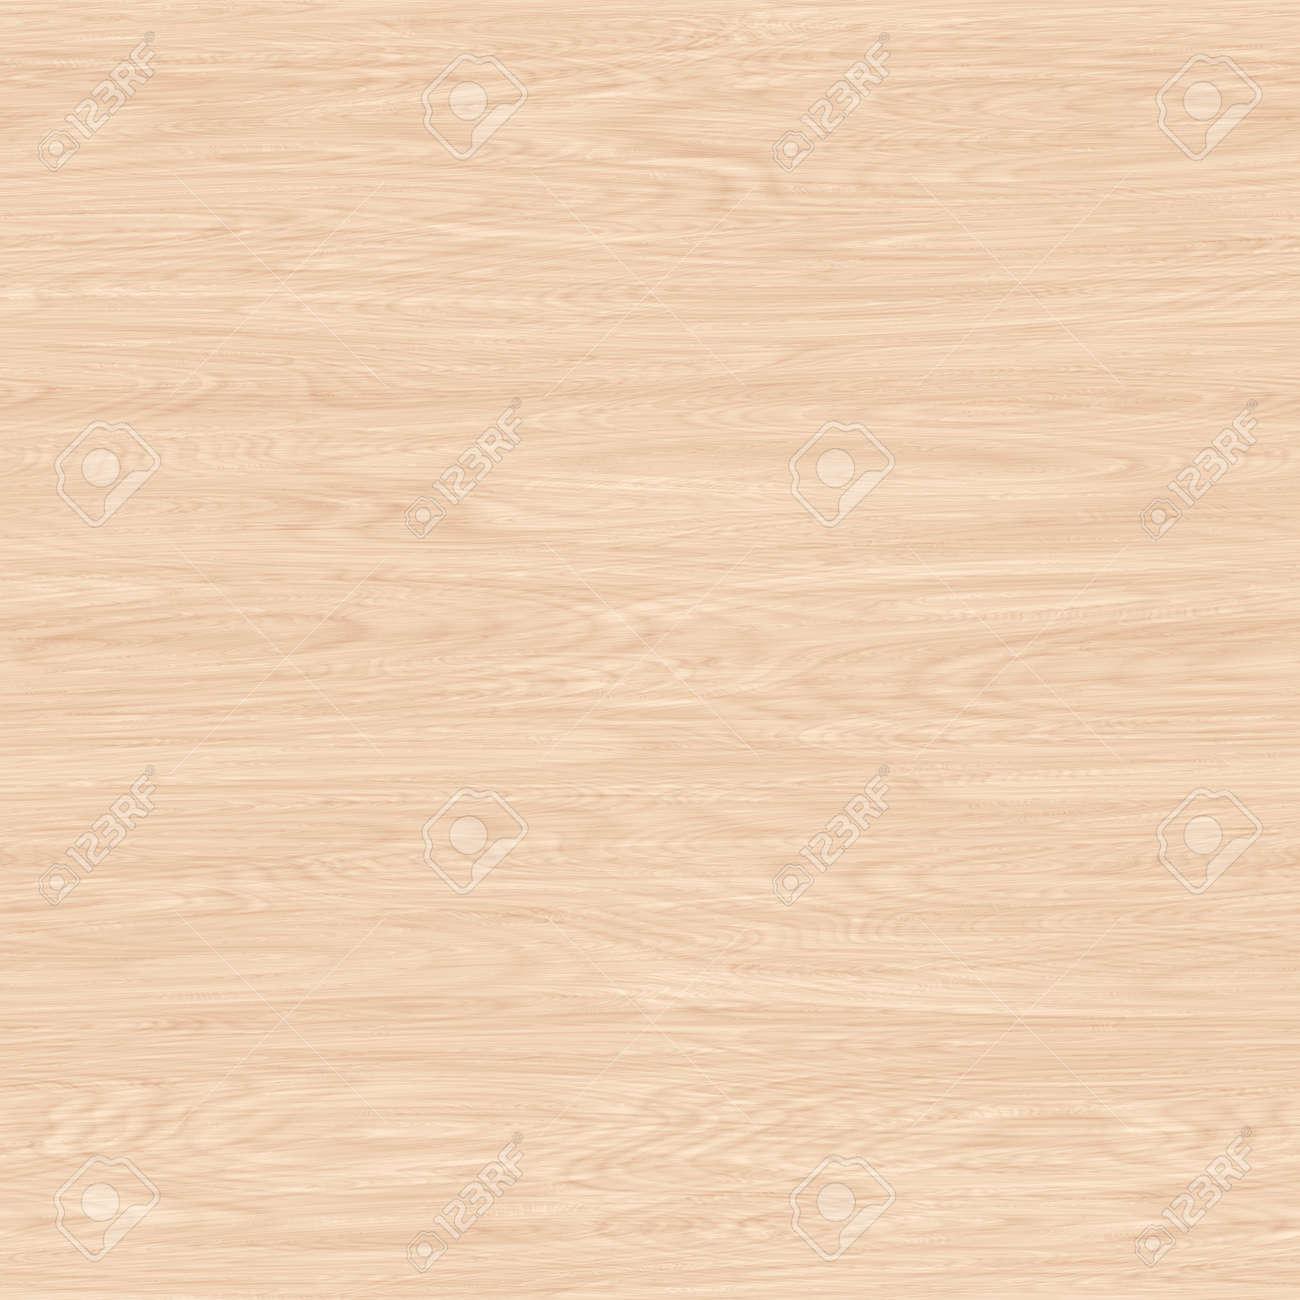 light wood floor background. Fine Wood Floor Background Seamless Light Texture Or  Decor Perfect Plank Flooring To Inspiration